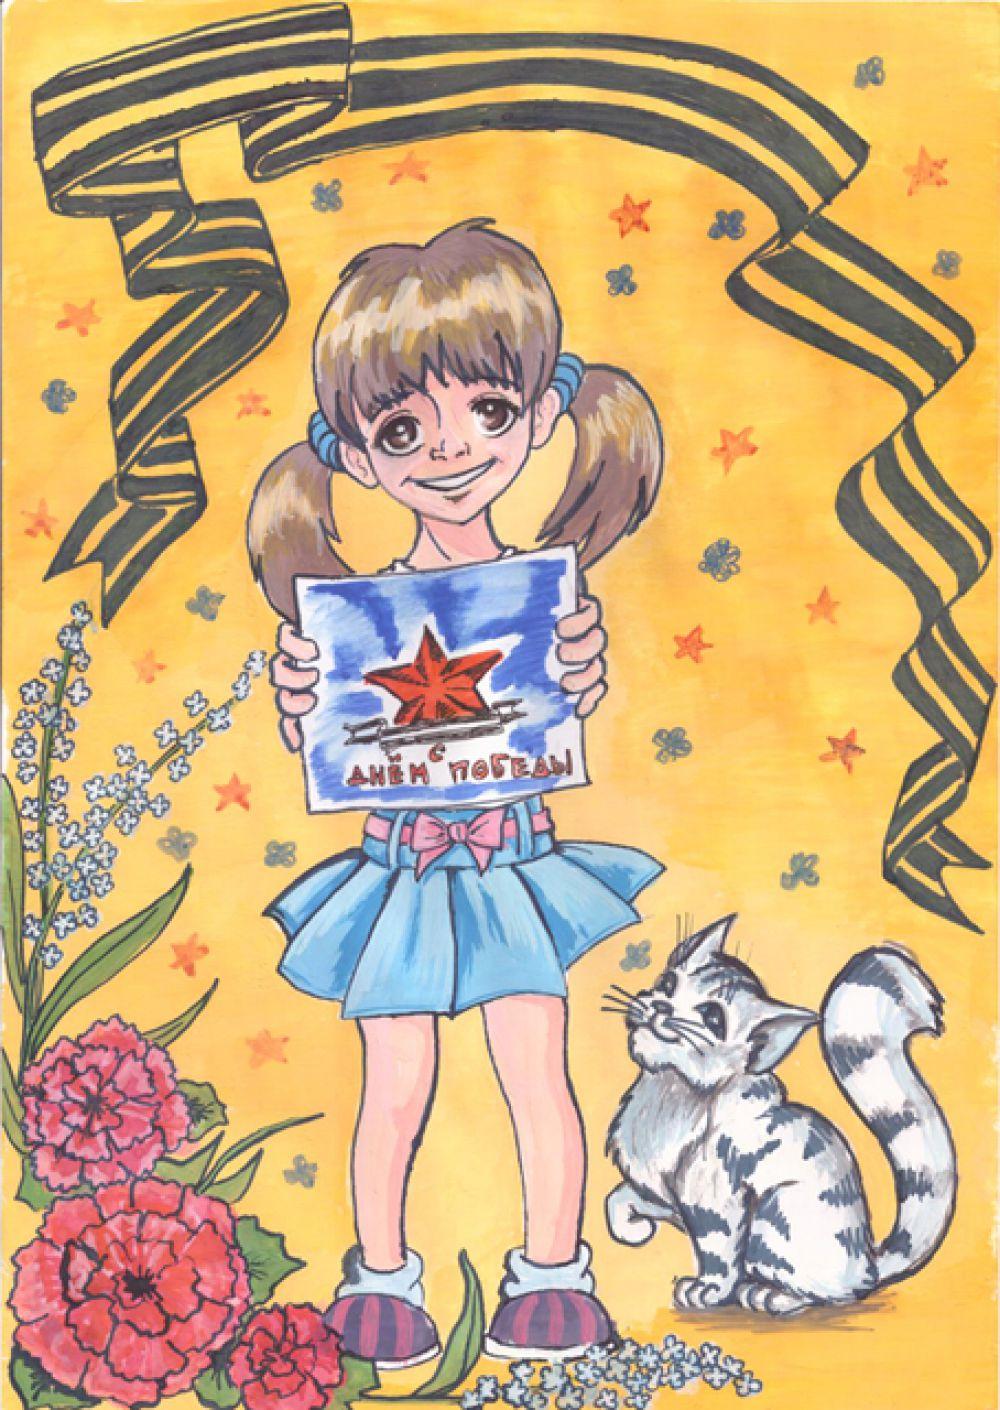 Участник №312. Ишмухаметова Алиса, 8 лет НСО г. Обь, средняя школа №2